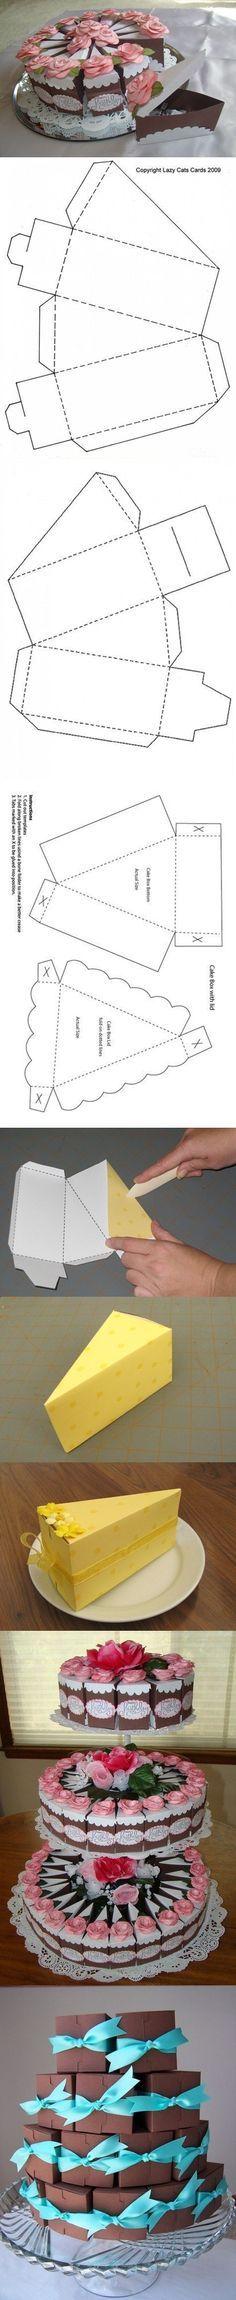 DIY Cake Gift Box | www.FabArtDIY.com LIKE Us on Facebook ==> https://www.facebook.com/FabArtDIY